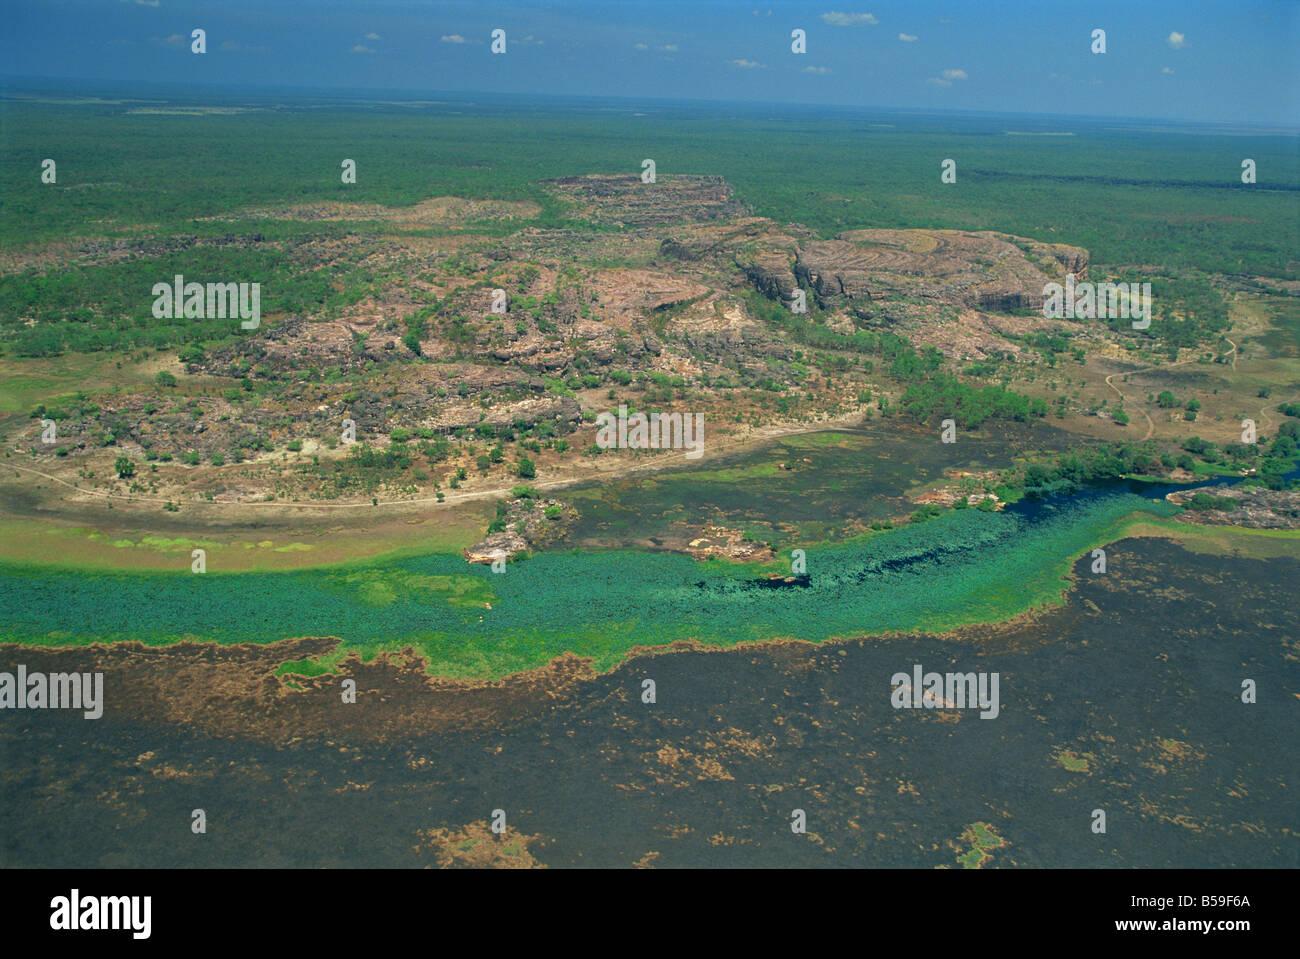 A billabong, on the floodplain of the East Alligator River near the border of Arnhemland and Kakadu National Park, - Stock Image